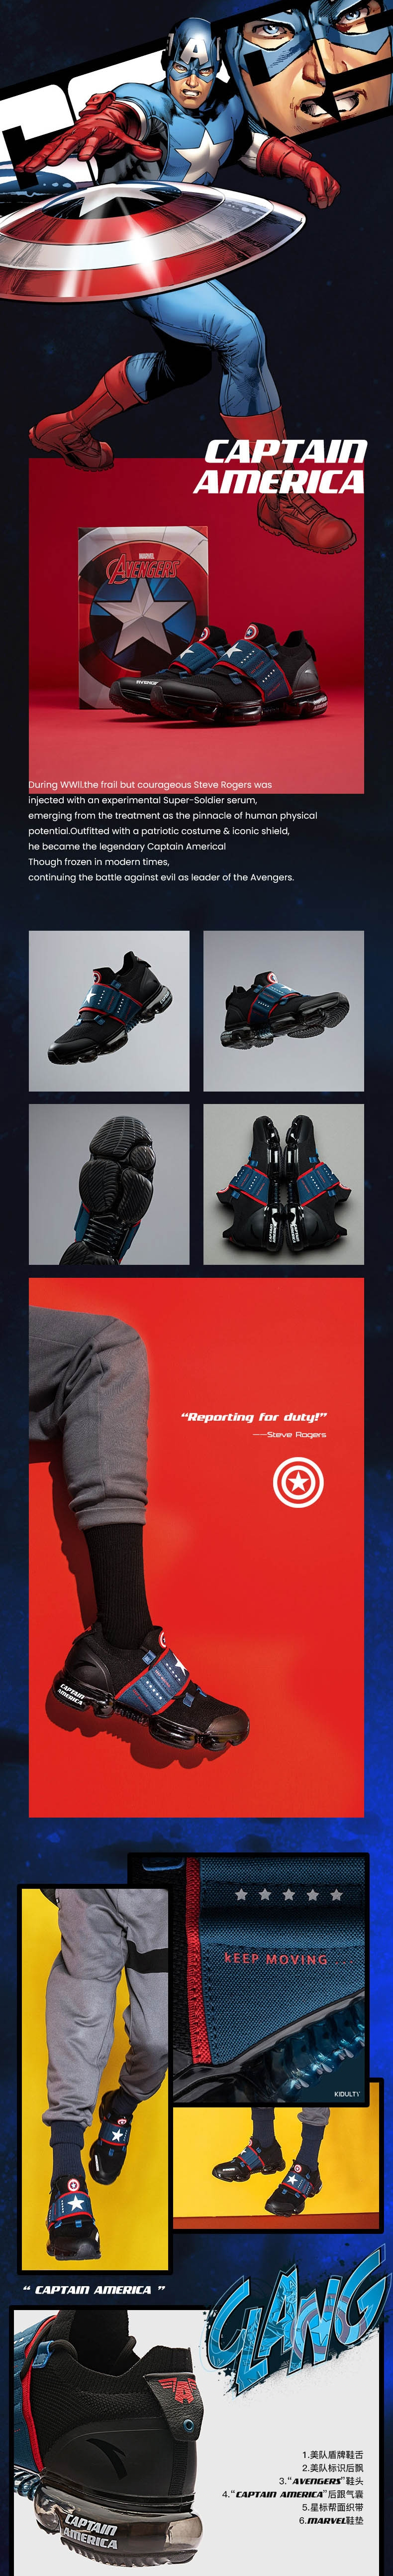 "Anta X Marvel ""CAPTAIN AMERICA"" Running Shoes Anta SEEED Running Sneakers"